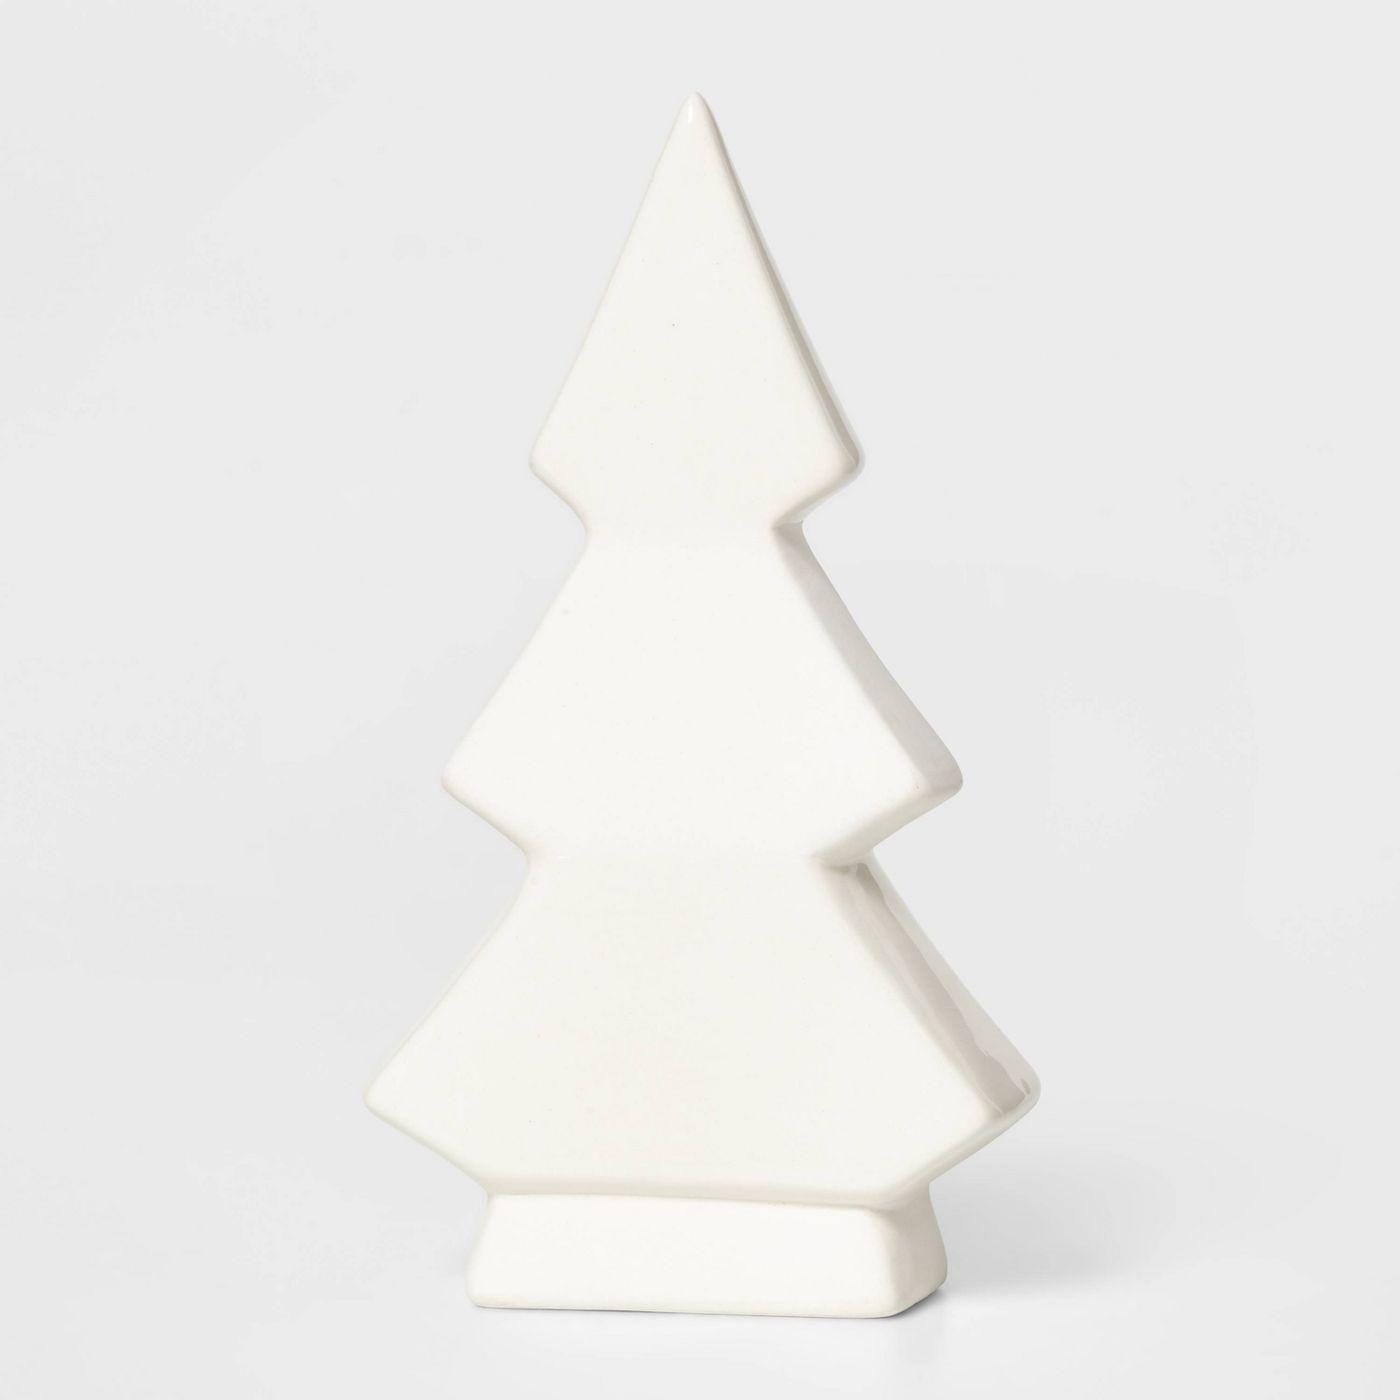 7in Ceramic 3-Tier Christmas Tree Decorative Figurine White - Wondershop™ - image 1 of 2